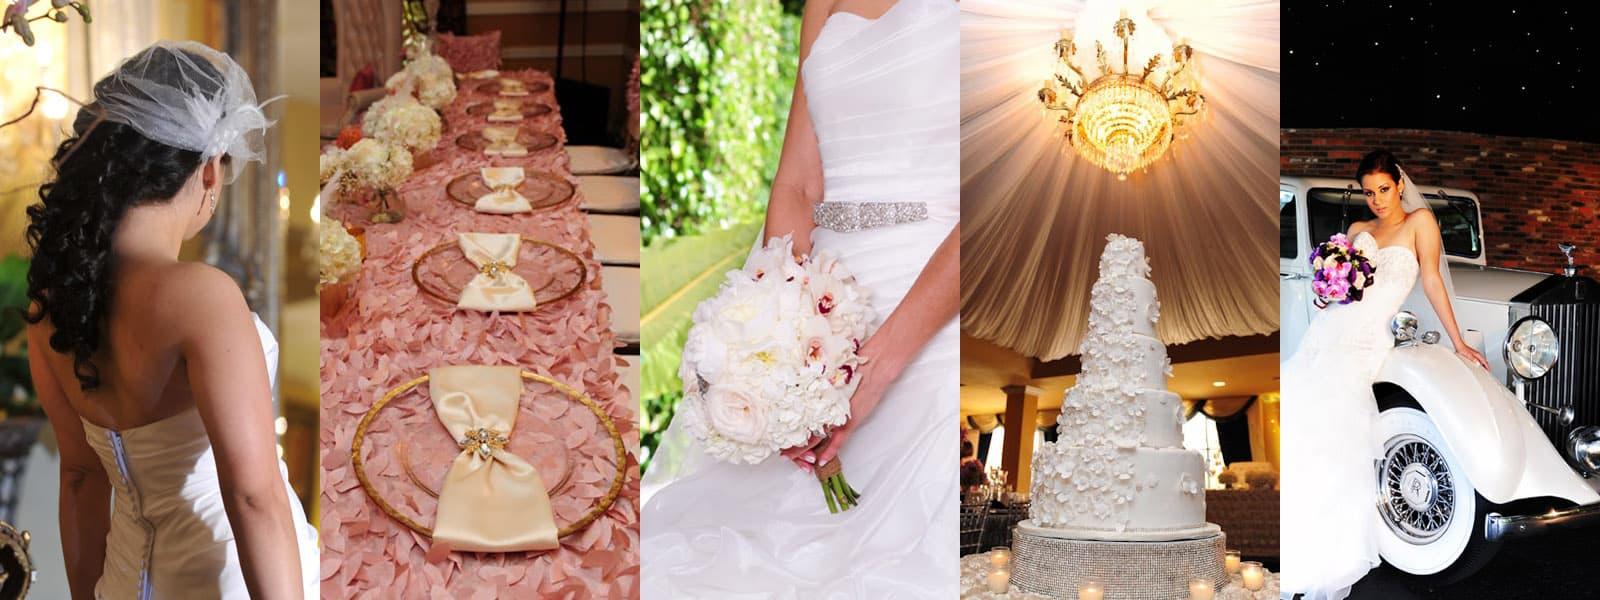 Stylart Wedding Invitations: Banquet Halls In Miami